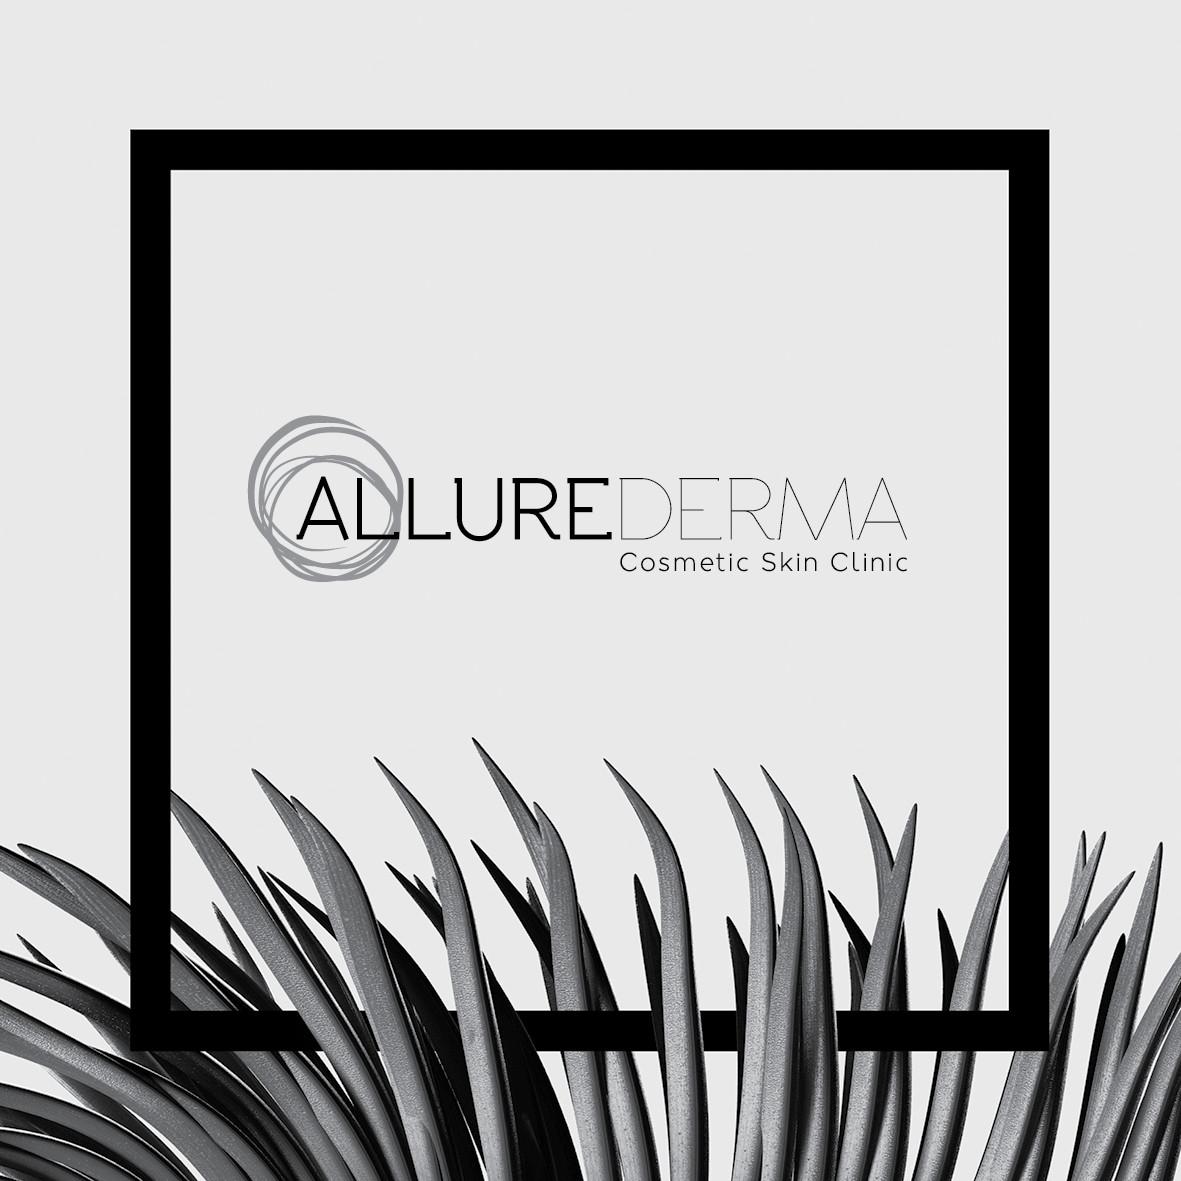 AllureDerma Cosmetic Skin Clinic